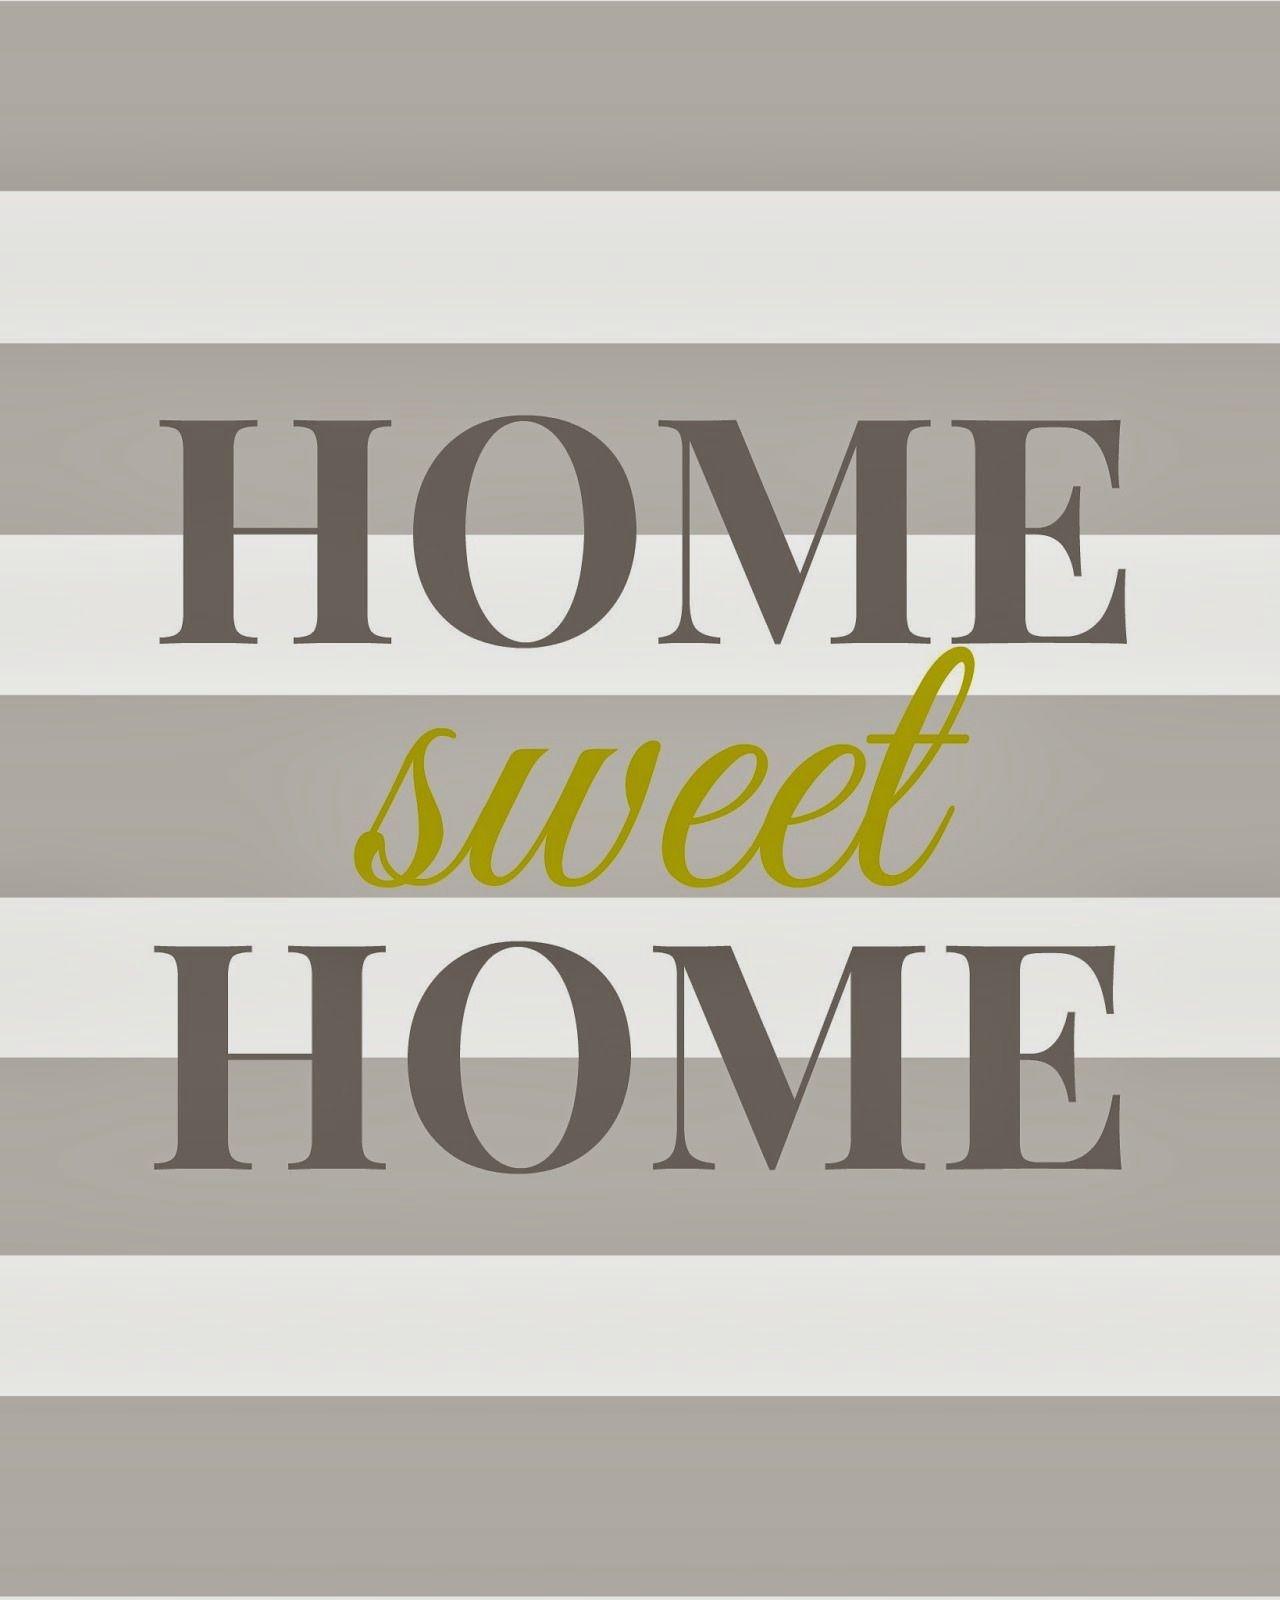 Home Sweet Home - Free Printable   Printables + Fonts   Home Decor - Home Sweet Home Free Printable